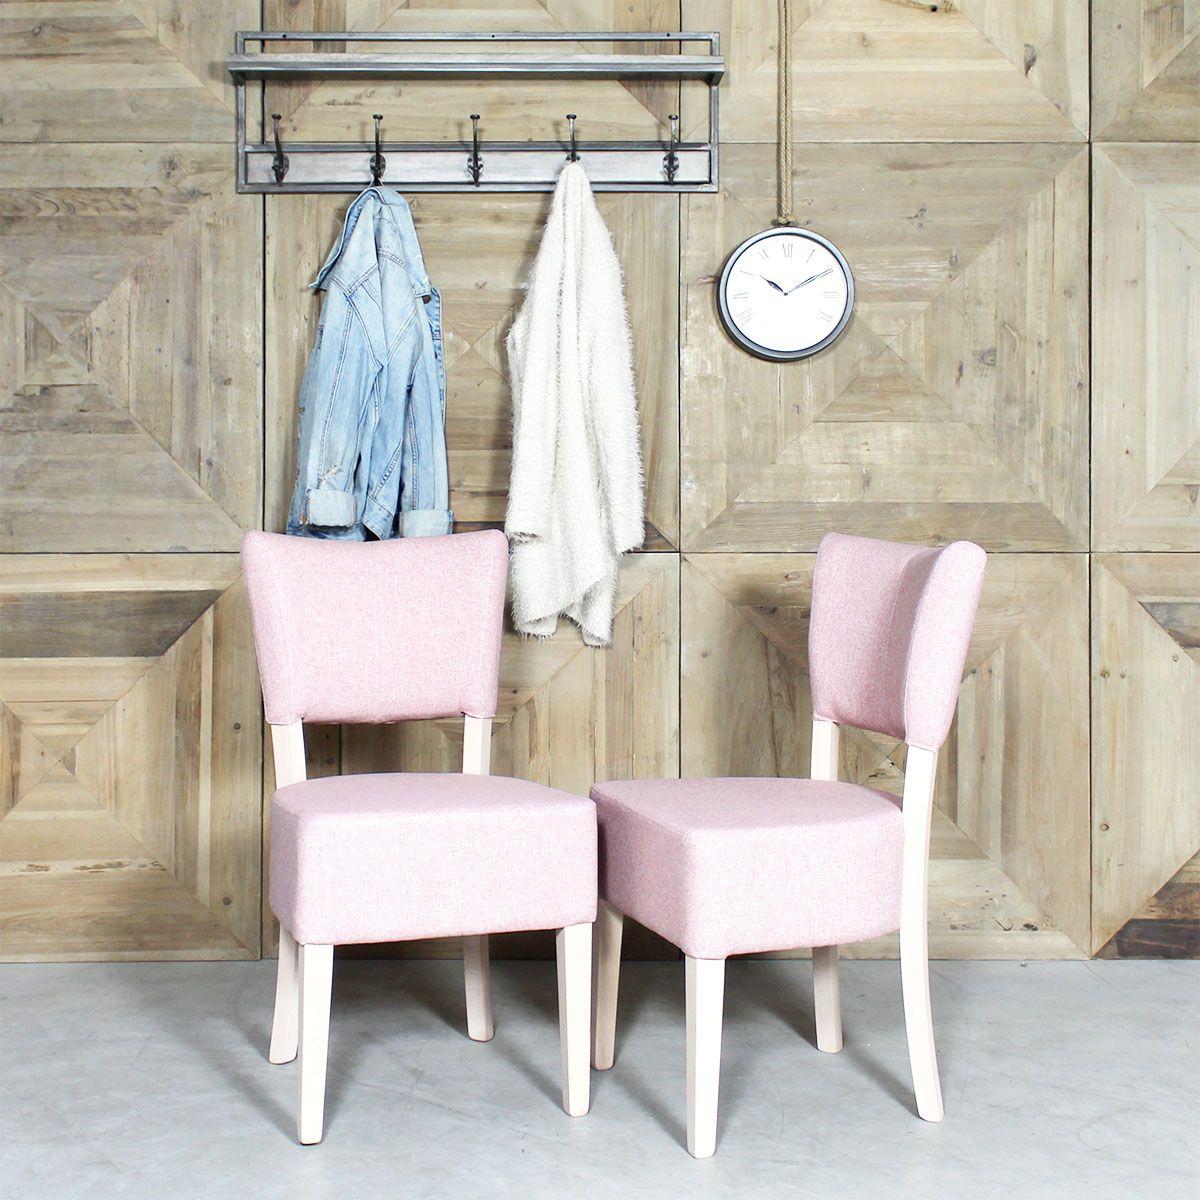 chaise bois massif tissu rose design chaises bois tissu rose et bois massif. Black Bedroom Furniture Sets. Home Design Ideas